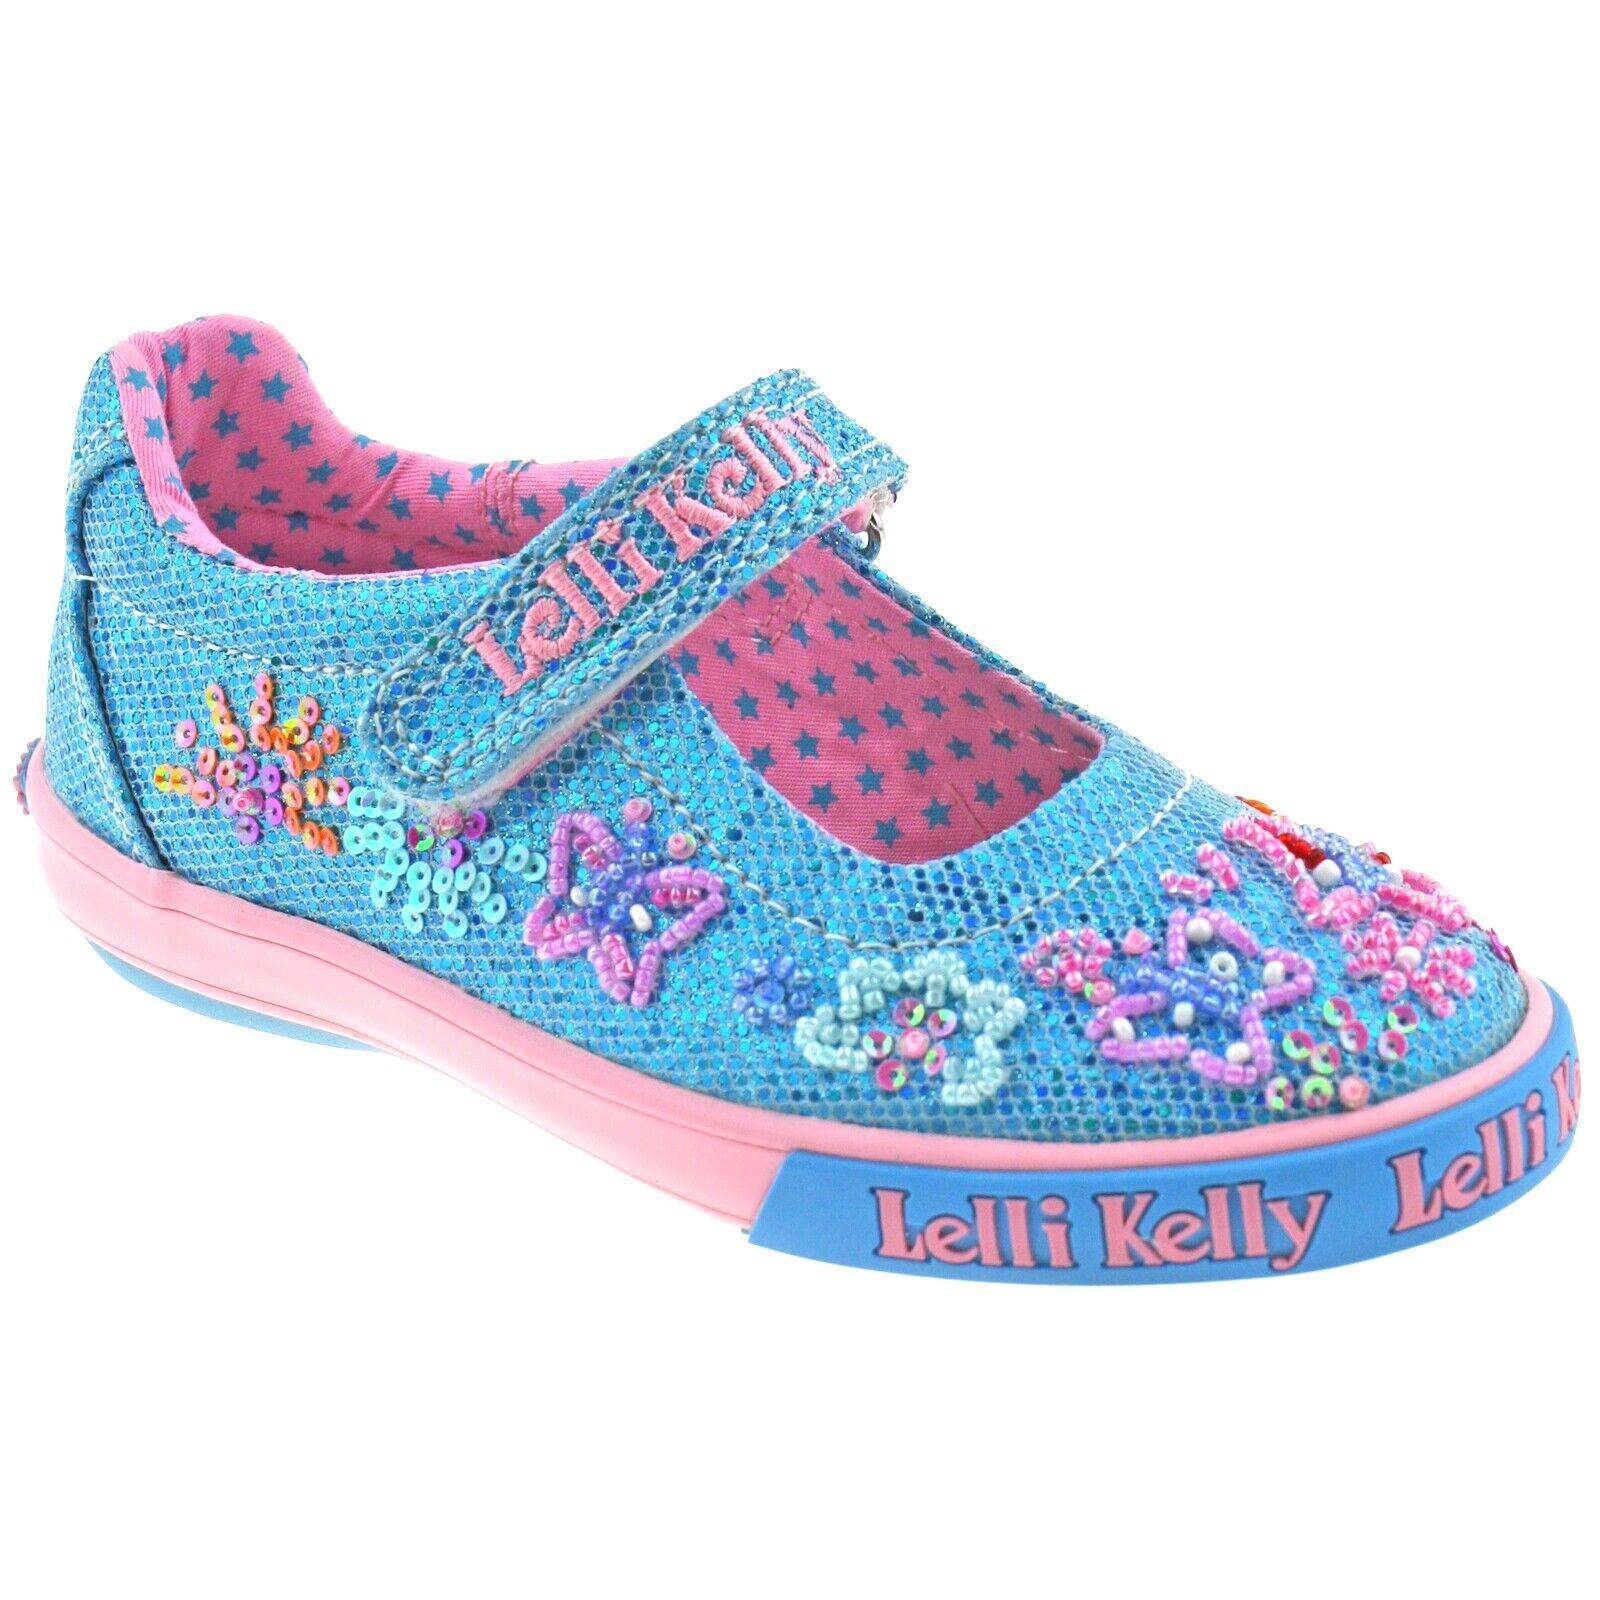 Lelli Kelly White GLITTER BUTTERFLY Canvas Dolly LK5076 FREE GIFT